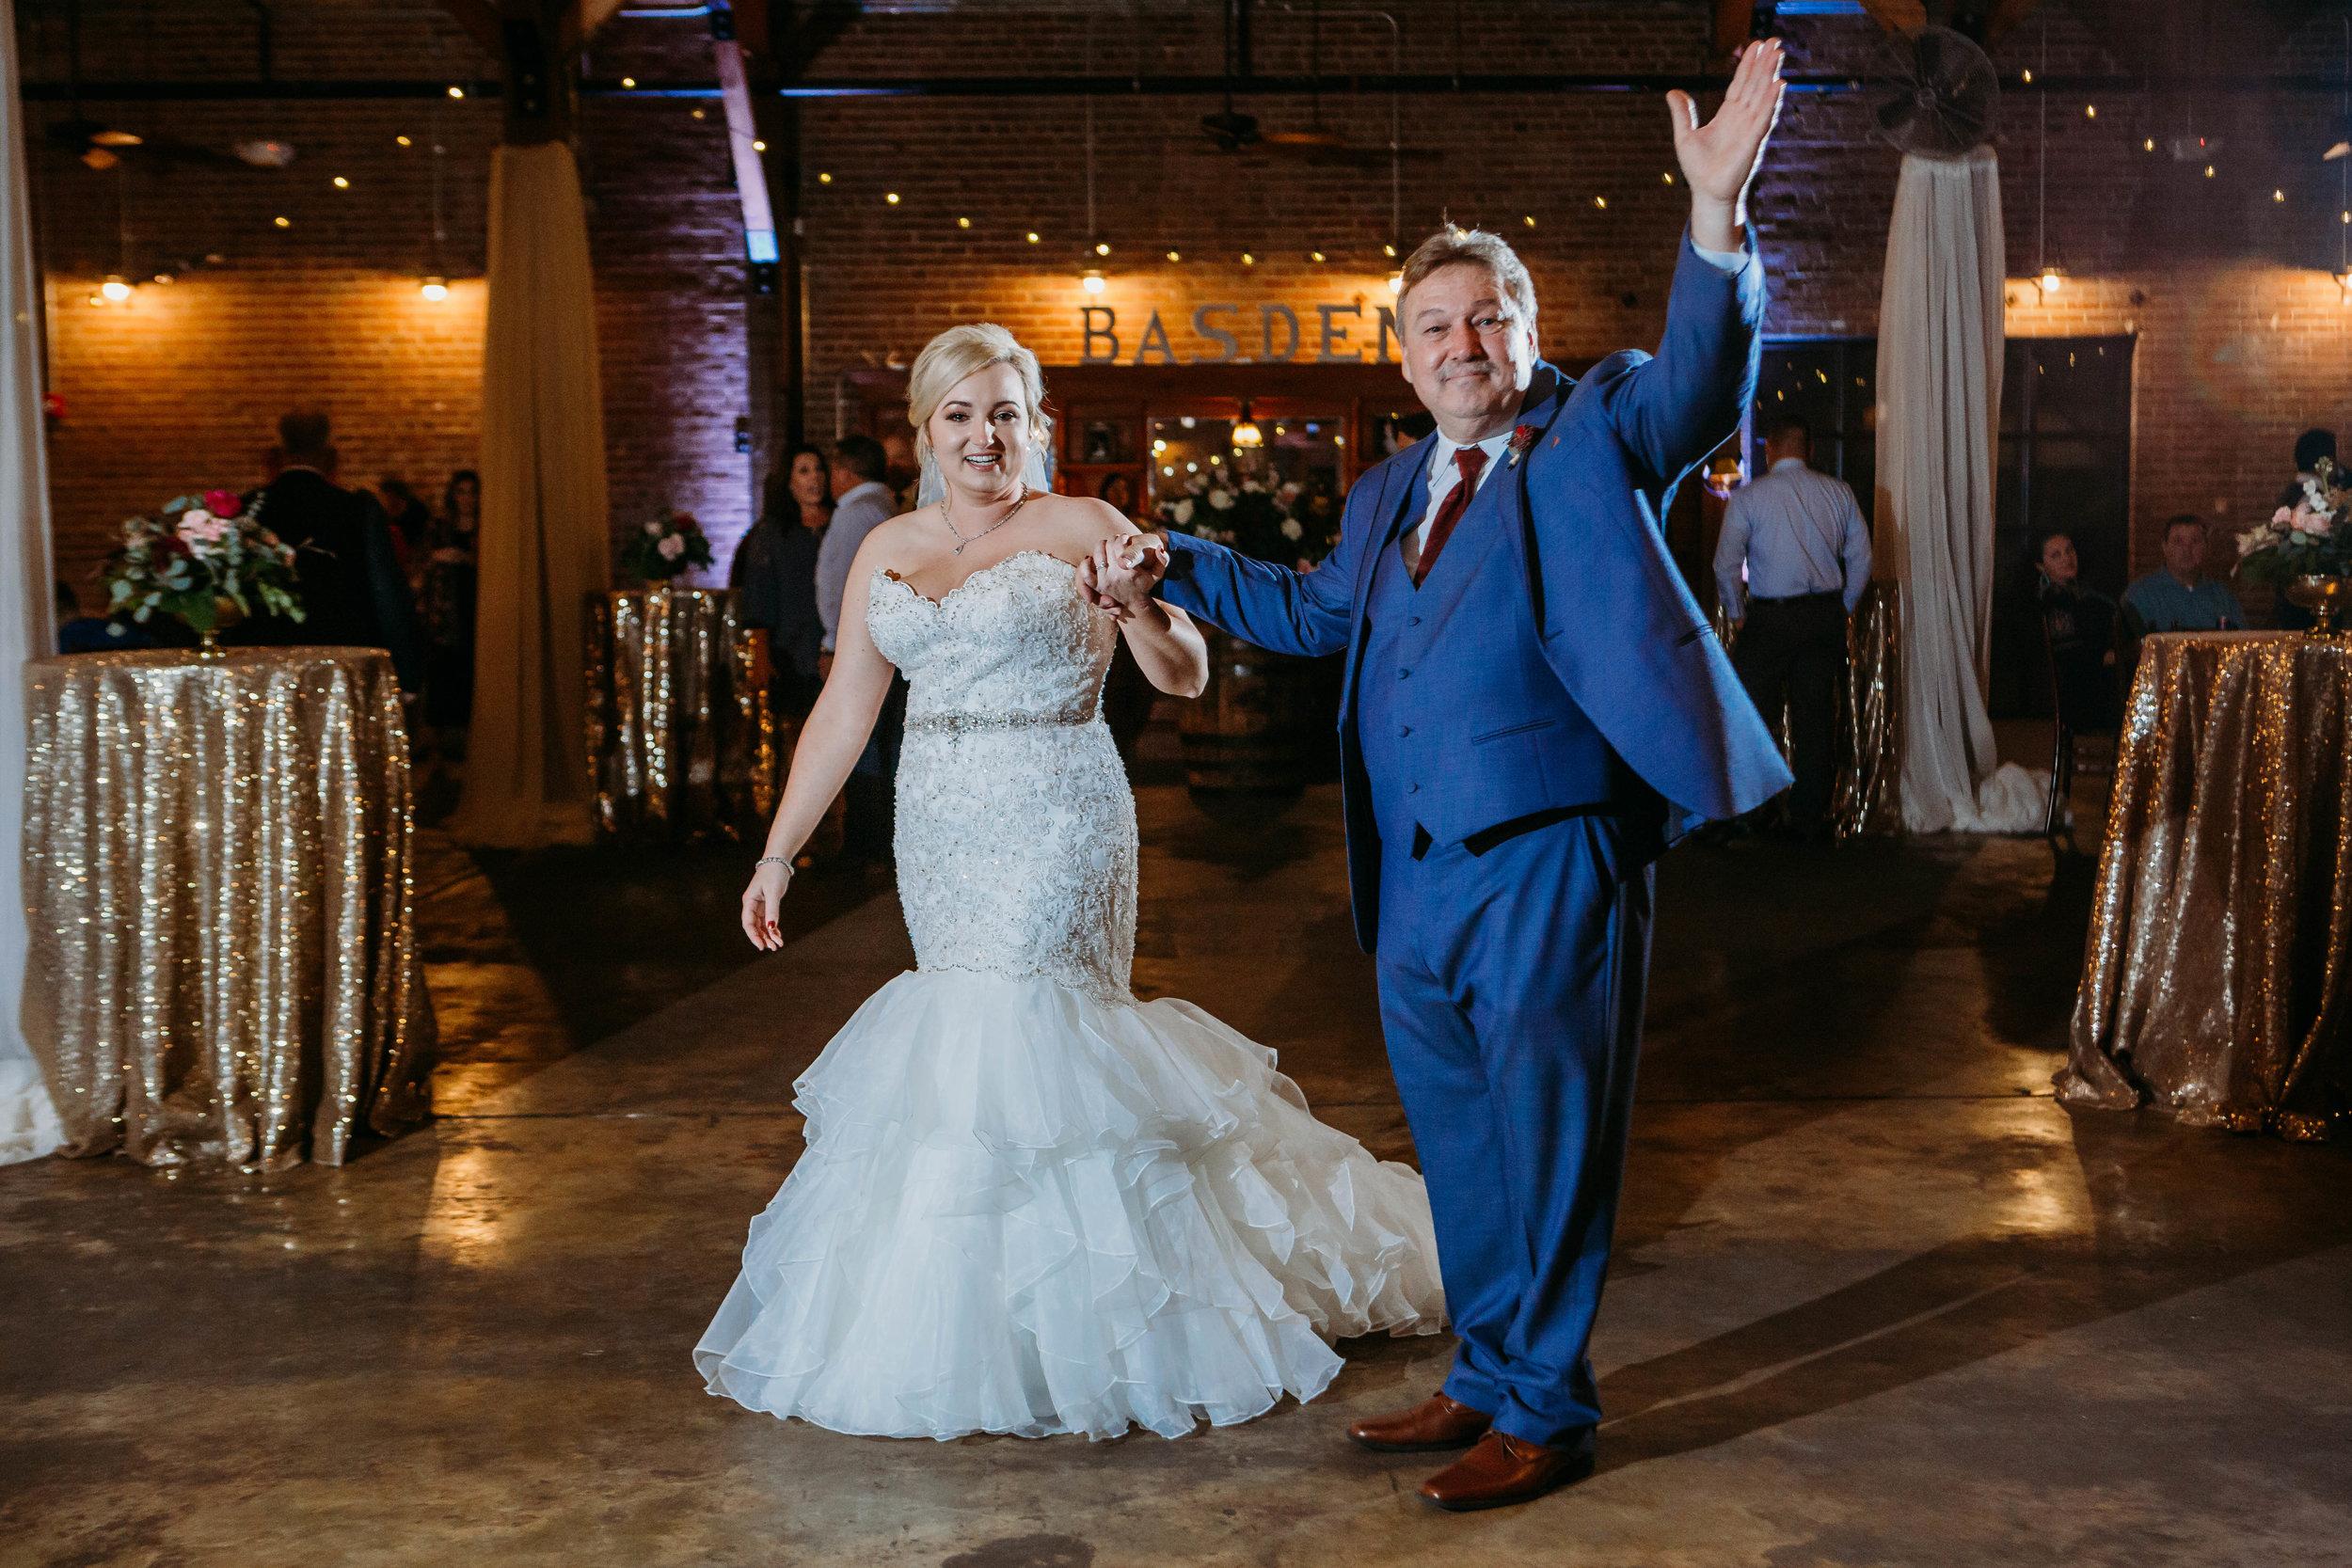 Basden's Wedding -634.jpg